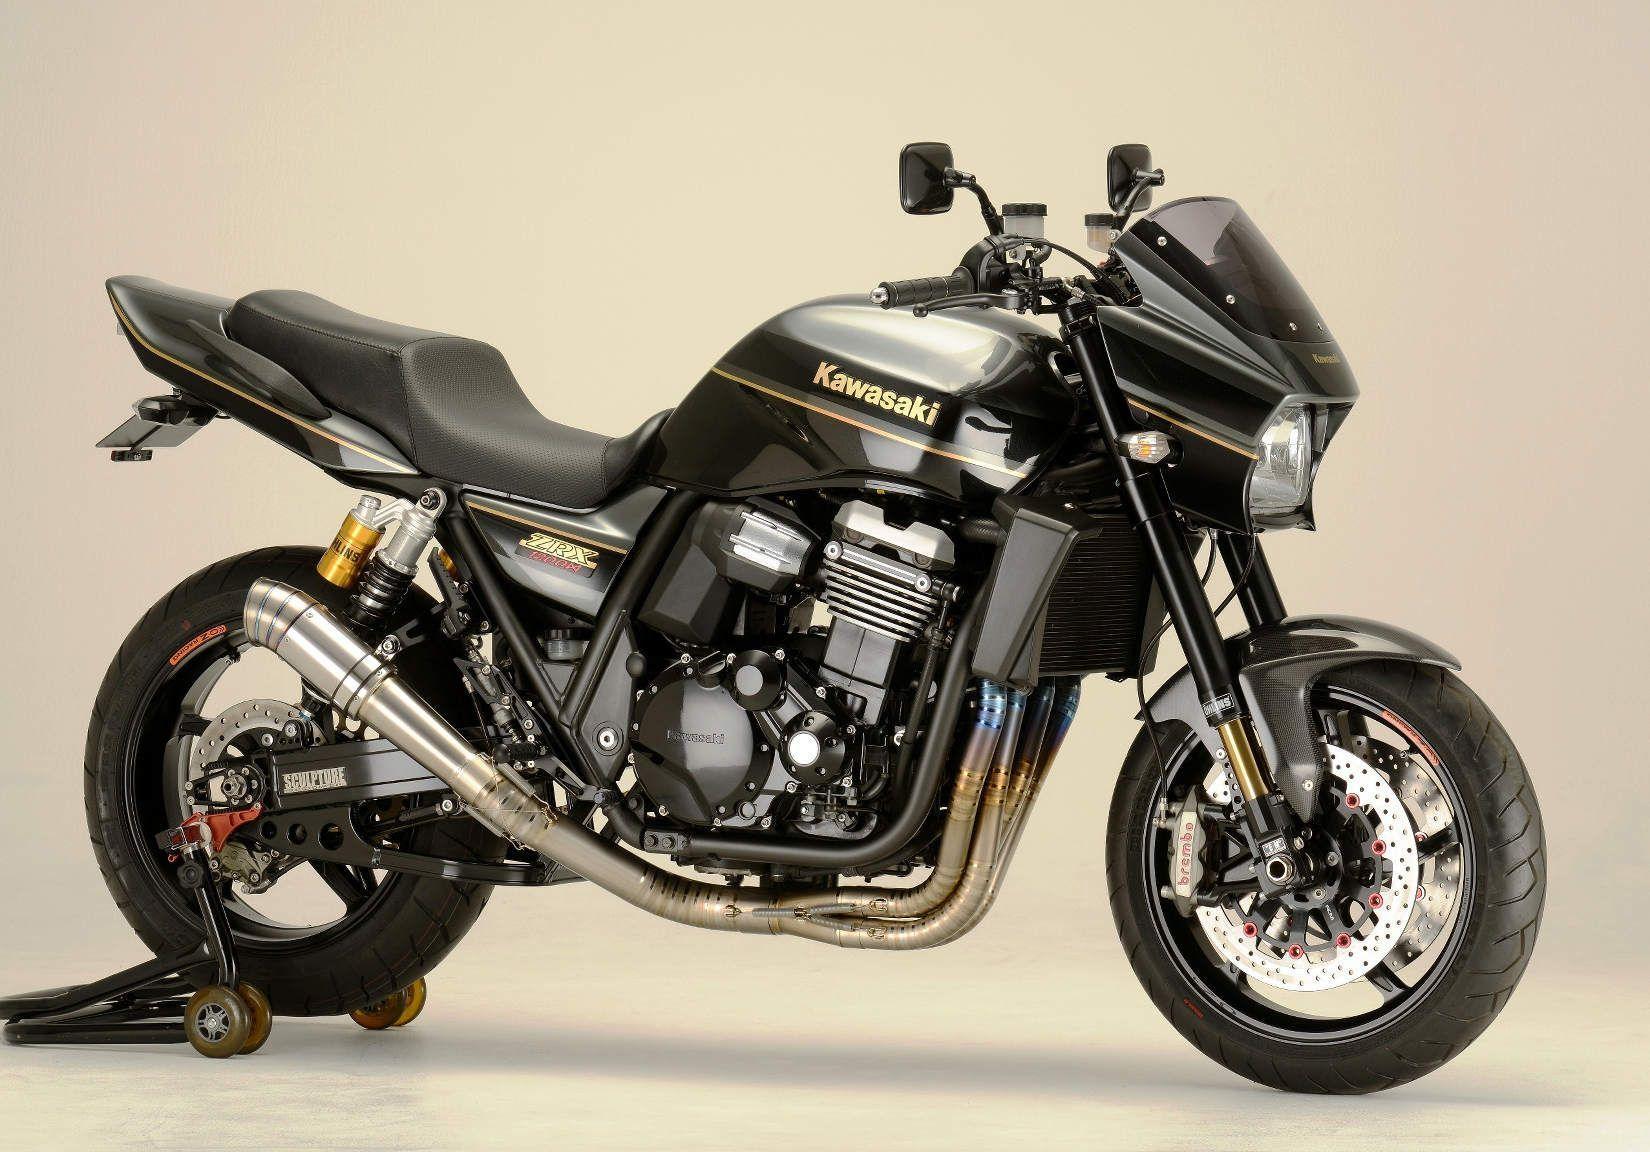 33 Best Free Kawasaki Zrx Wallpapers Wallpaperaccess Wiring Diagrams 1600x1200 2011 Zrx1200 Daeg Motozombdrivecom